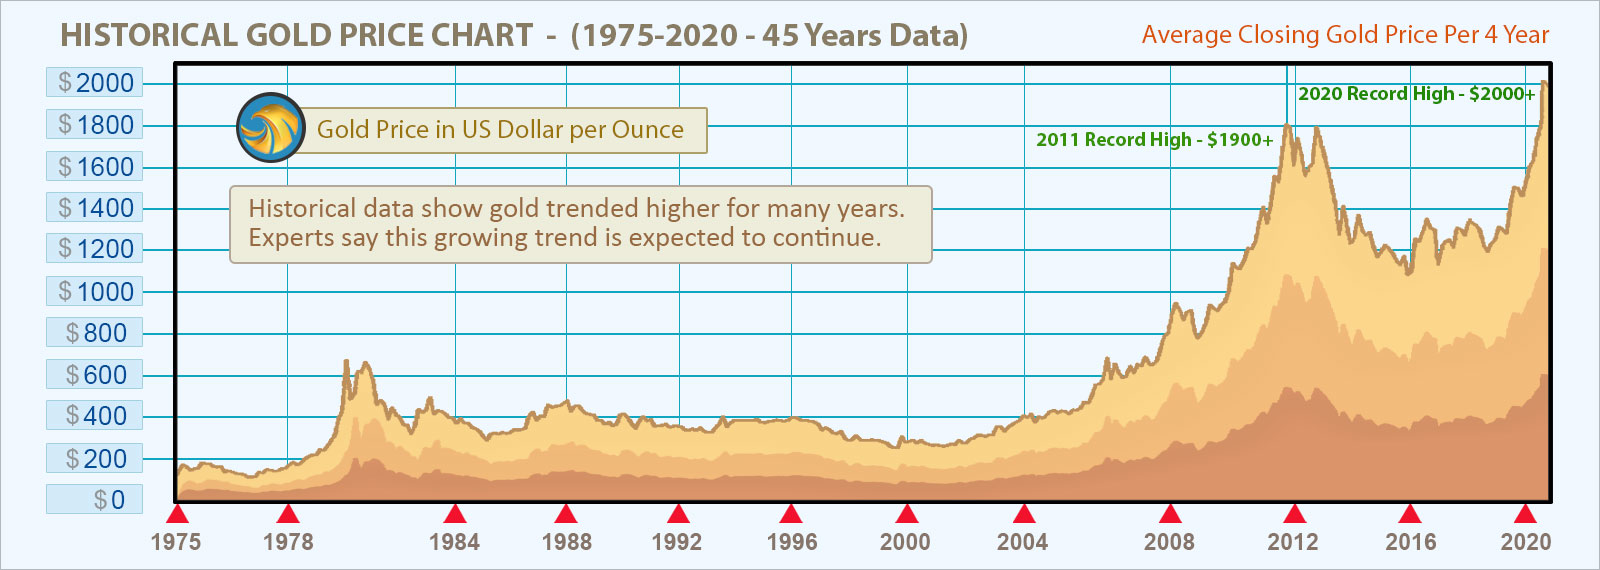 Historical gold price chart - 45 years data